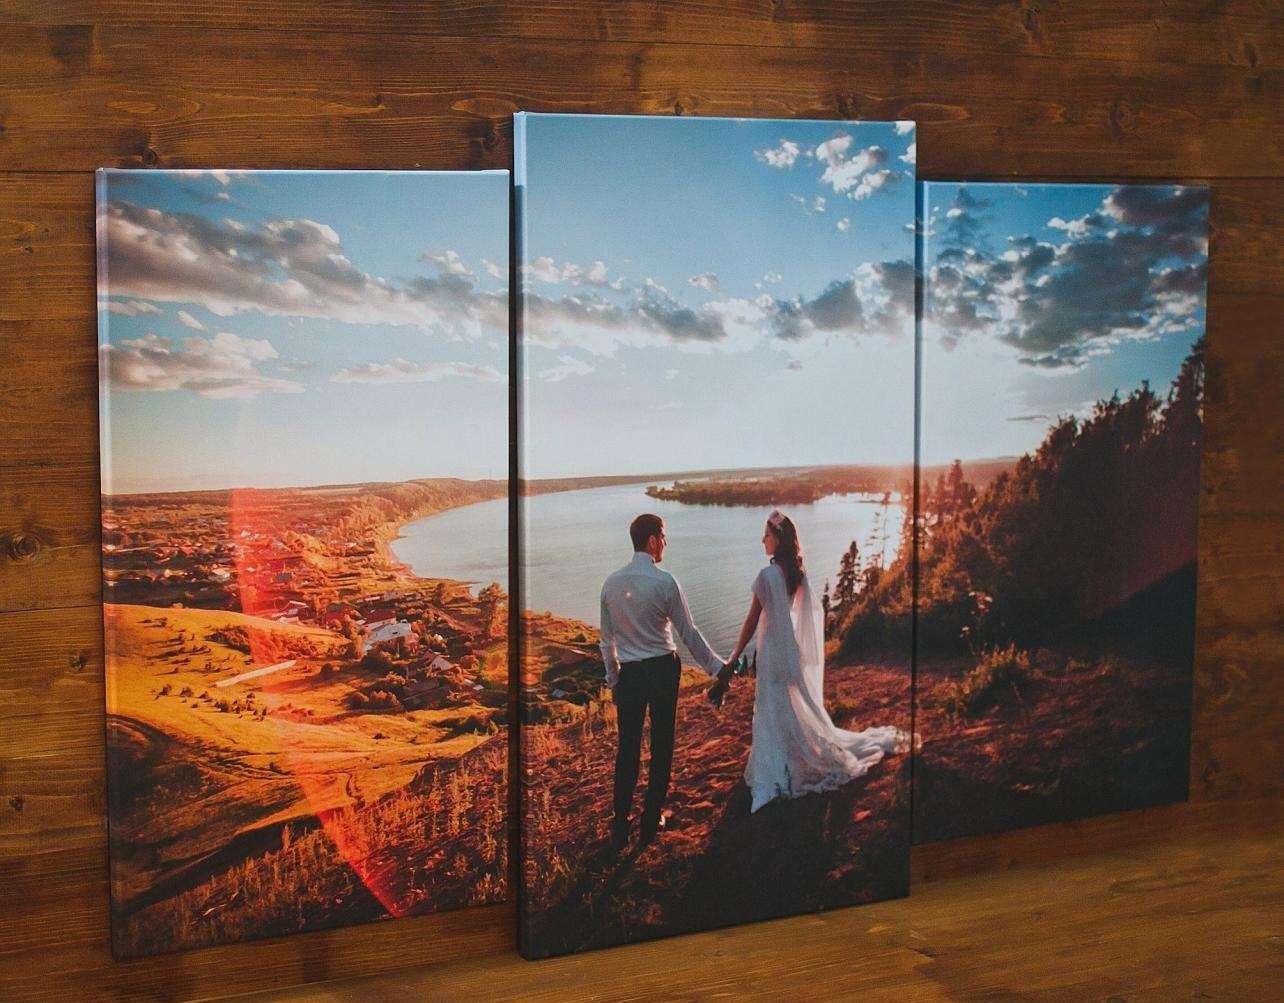 Распечатка фотографий на холсте екатеринбург